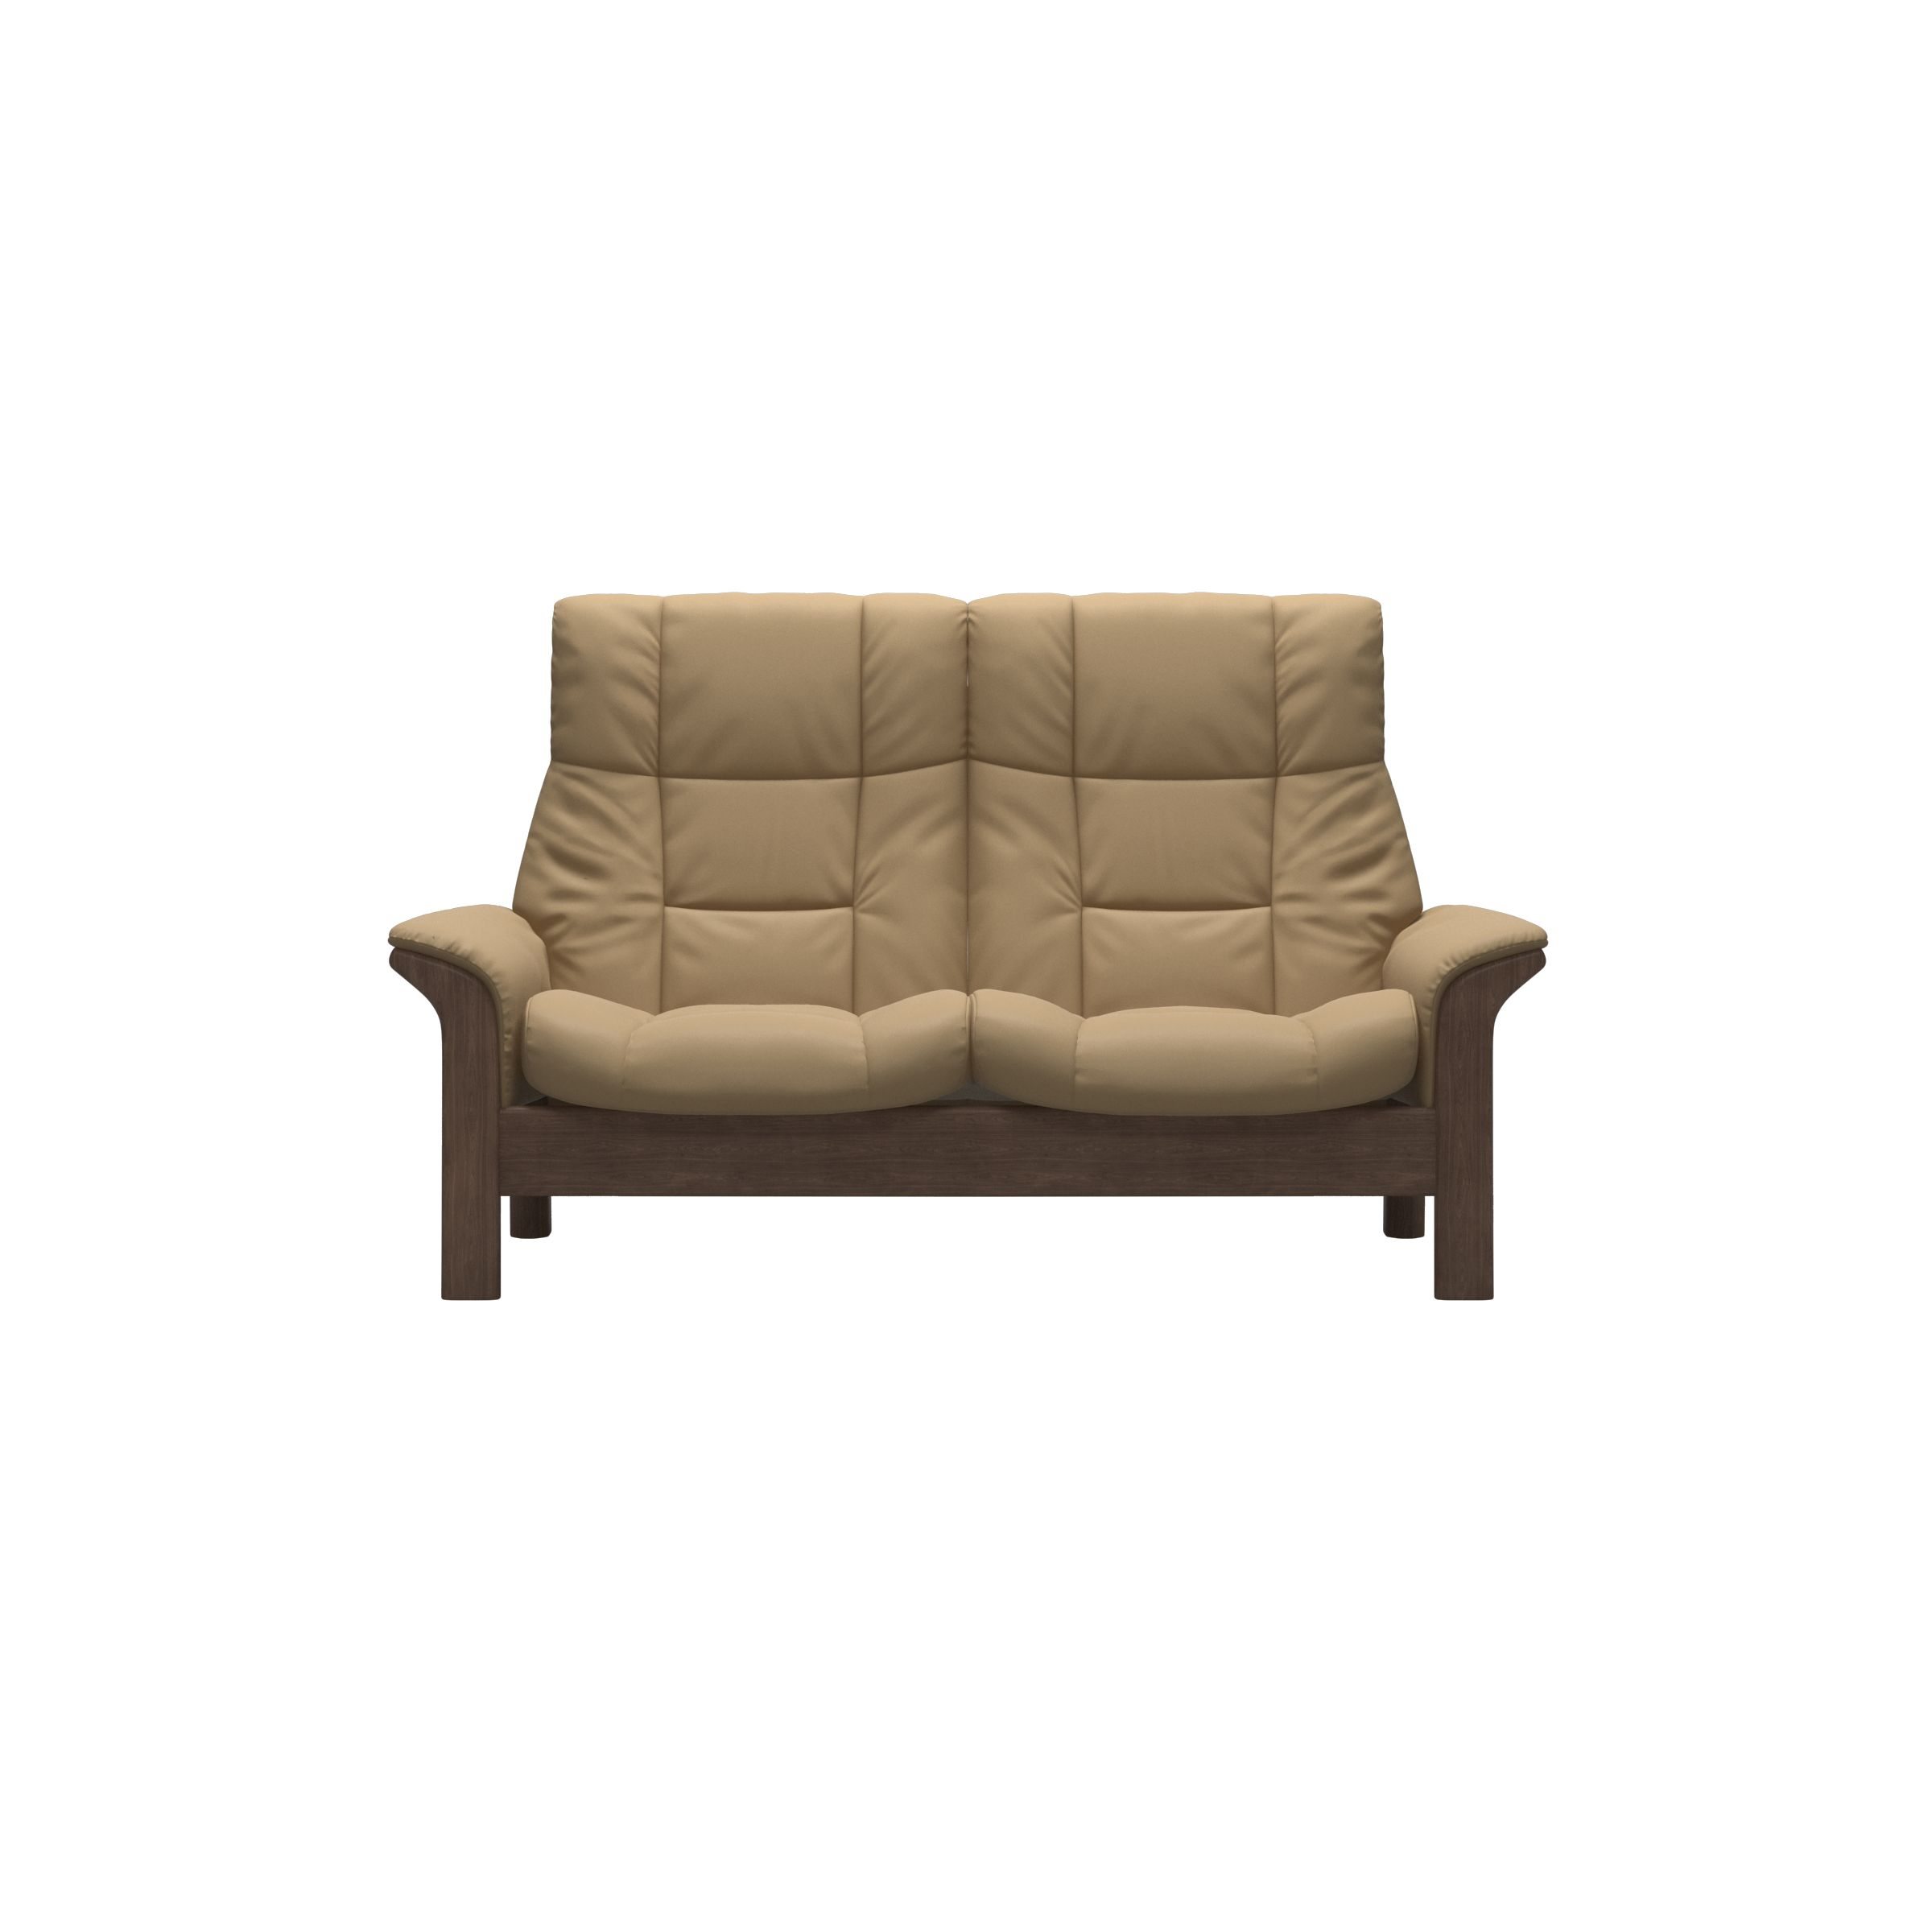 Stressless Buckingham sofa for Living Room at Mums Place Furniture Carmel CA